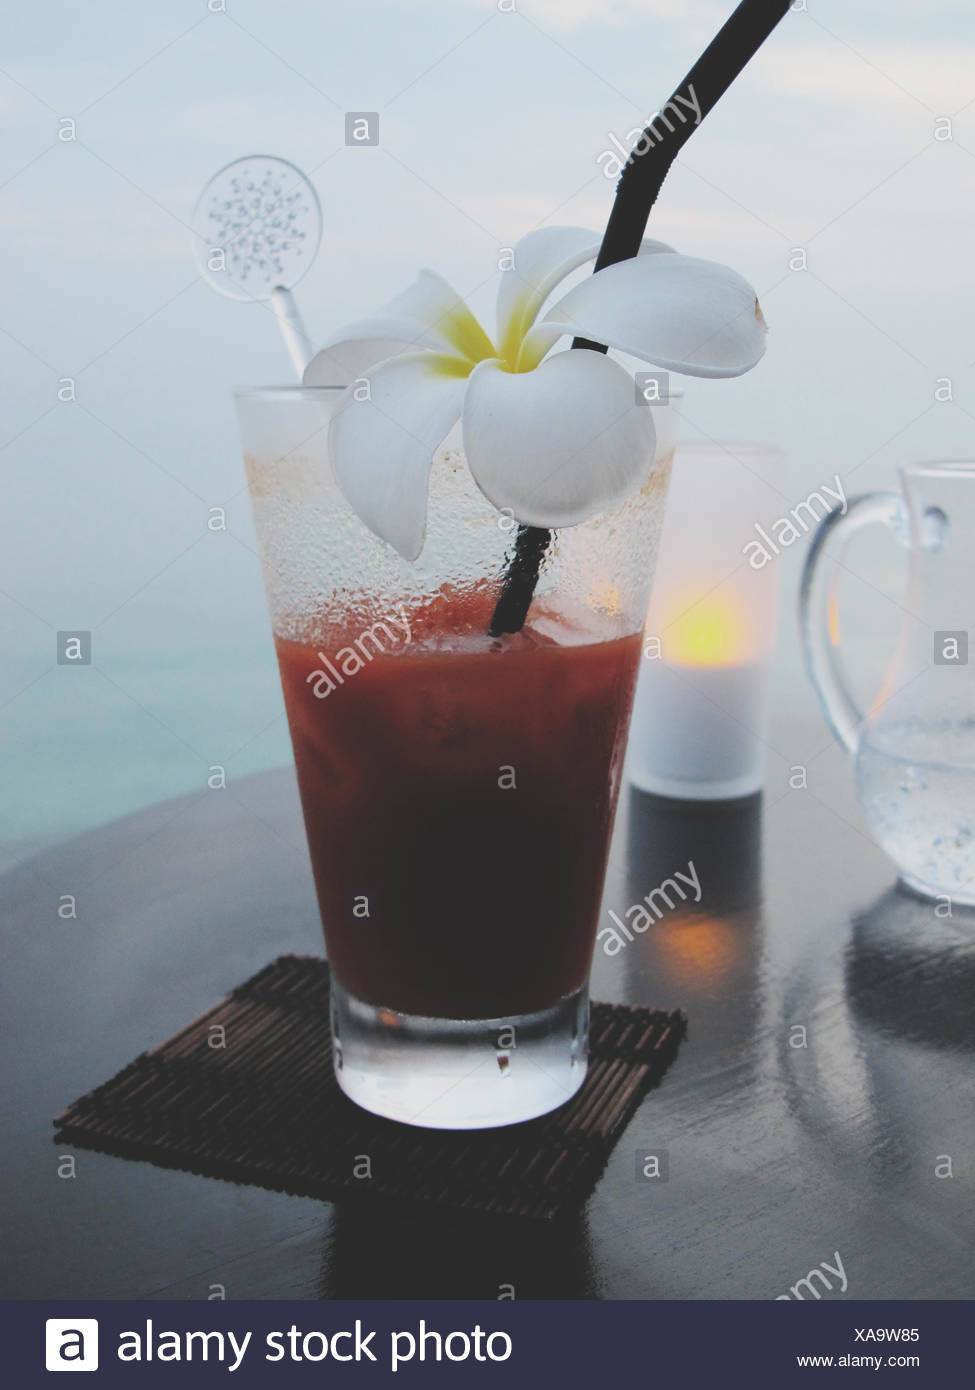 Fresh Margarita Decorated With White Flower - Stock Image